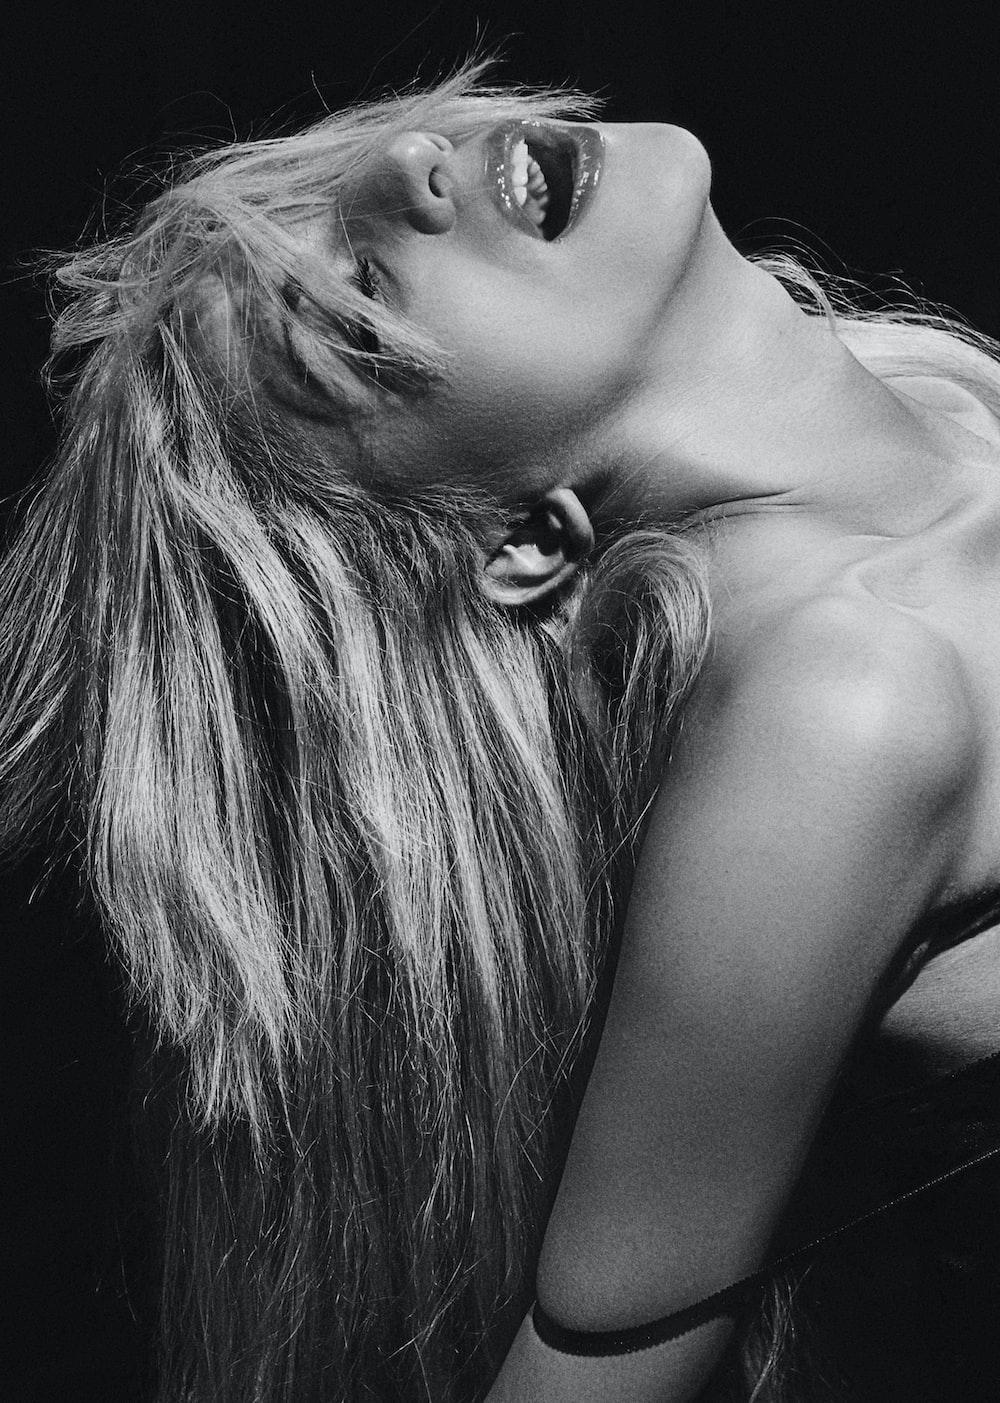 woman grayscale photo